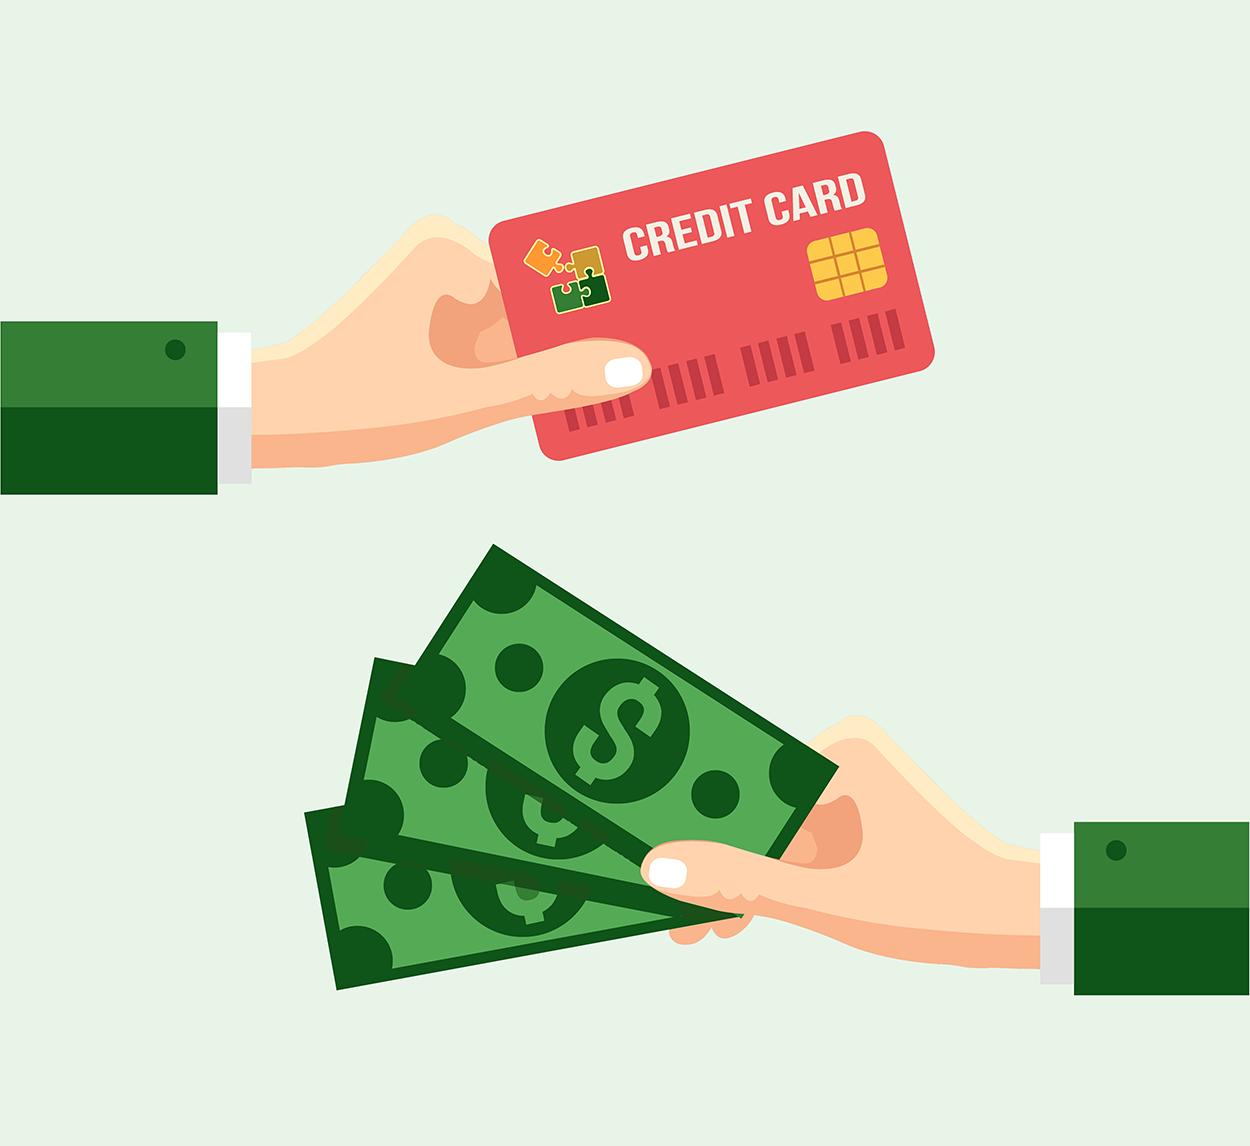 Credit Card Minimum Payment Interest vs Principal Caclulator